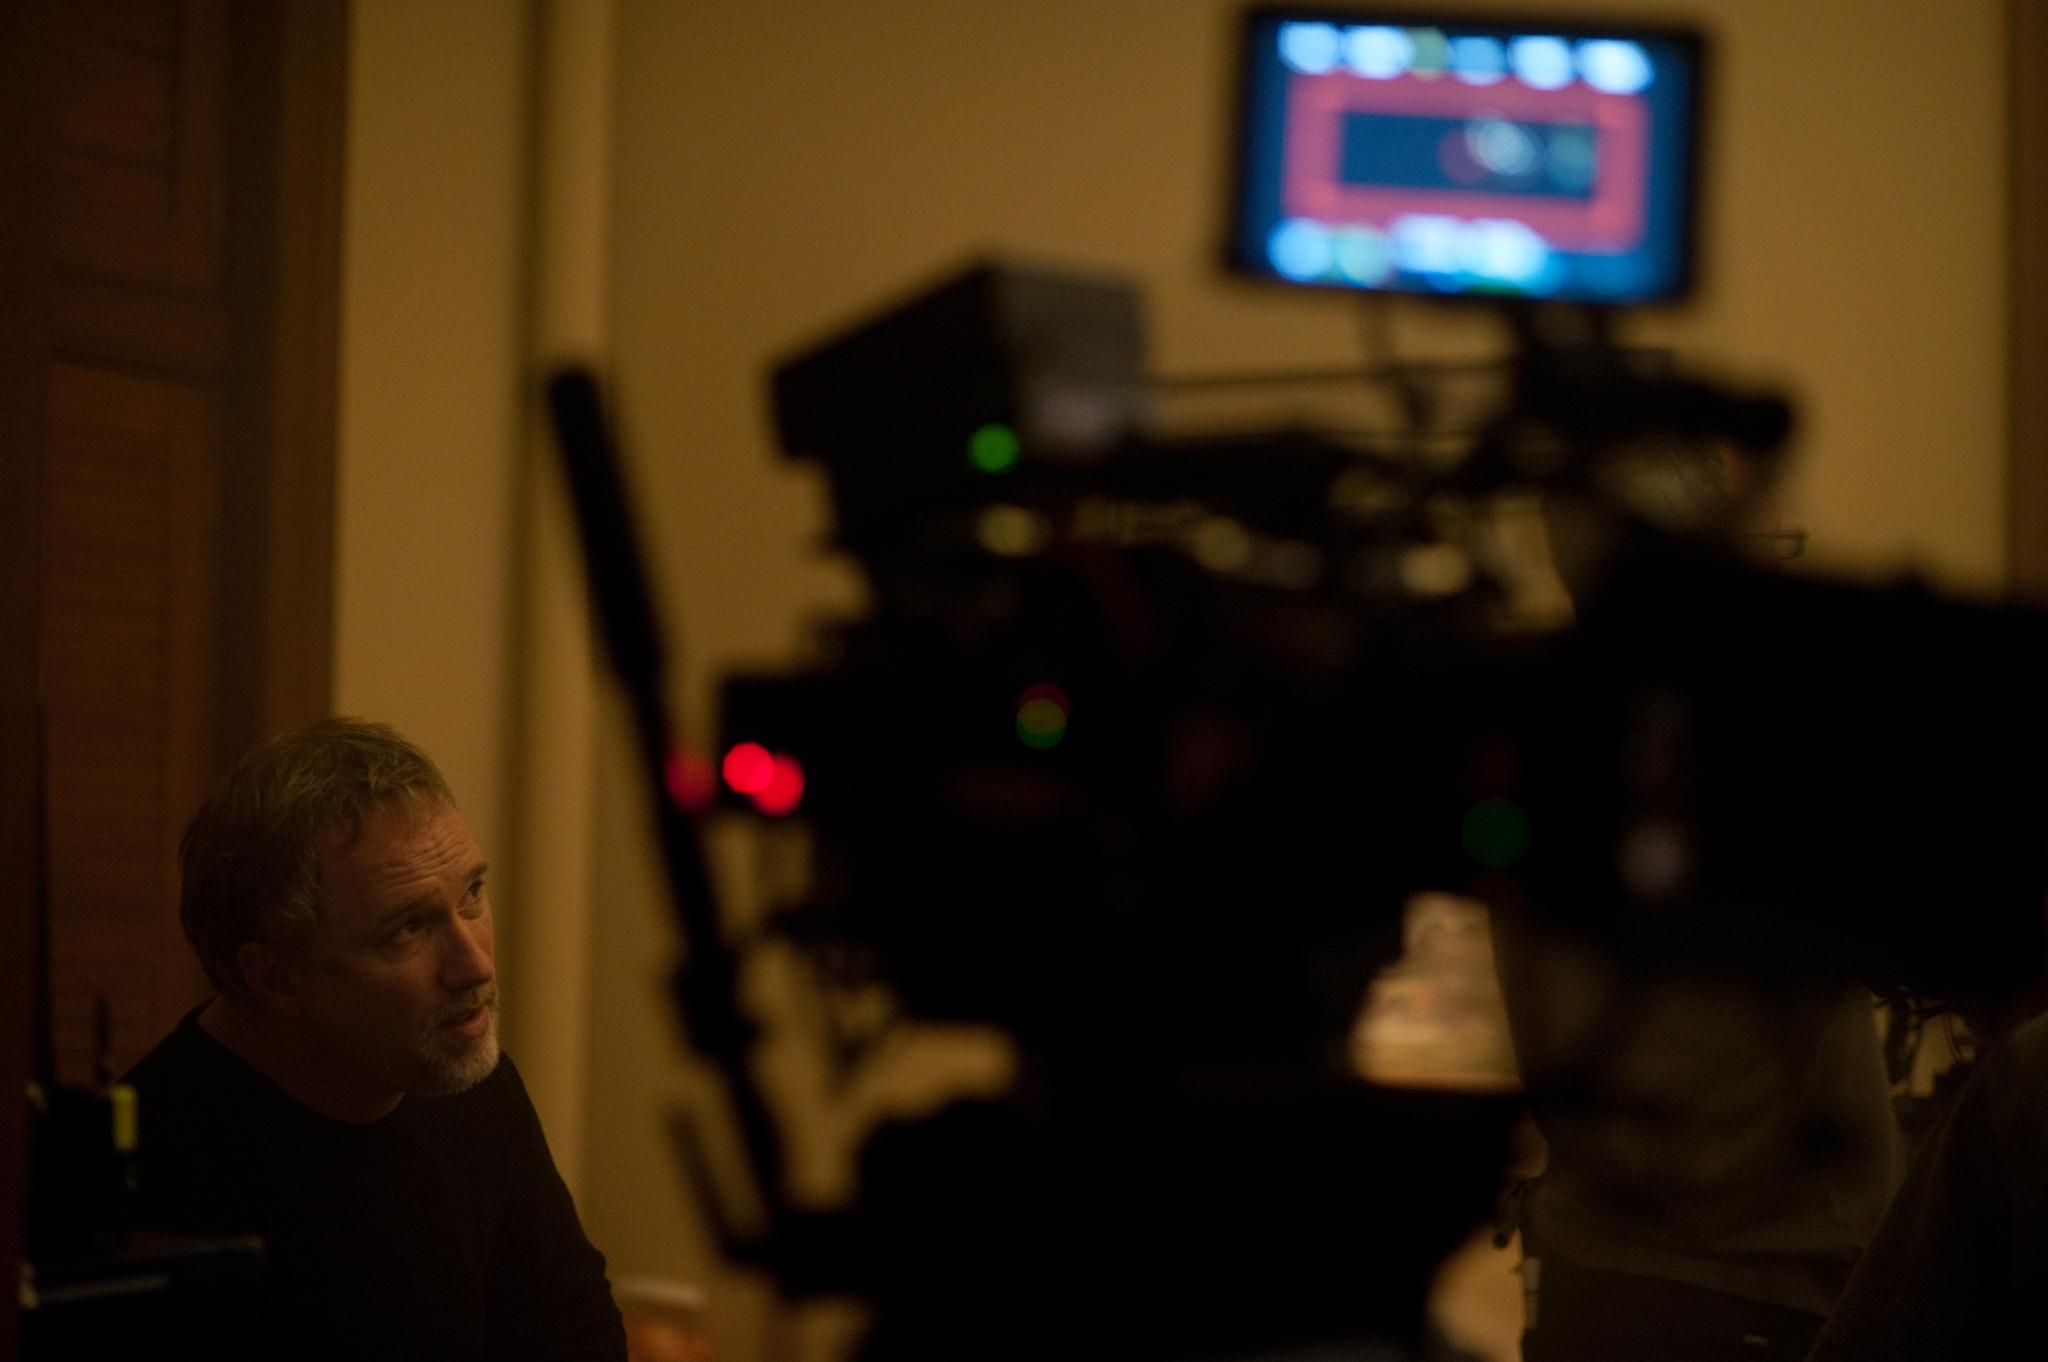 David Fincher in The Social Network (2010)